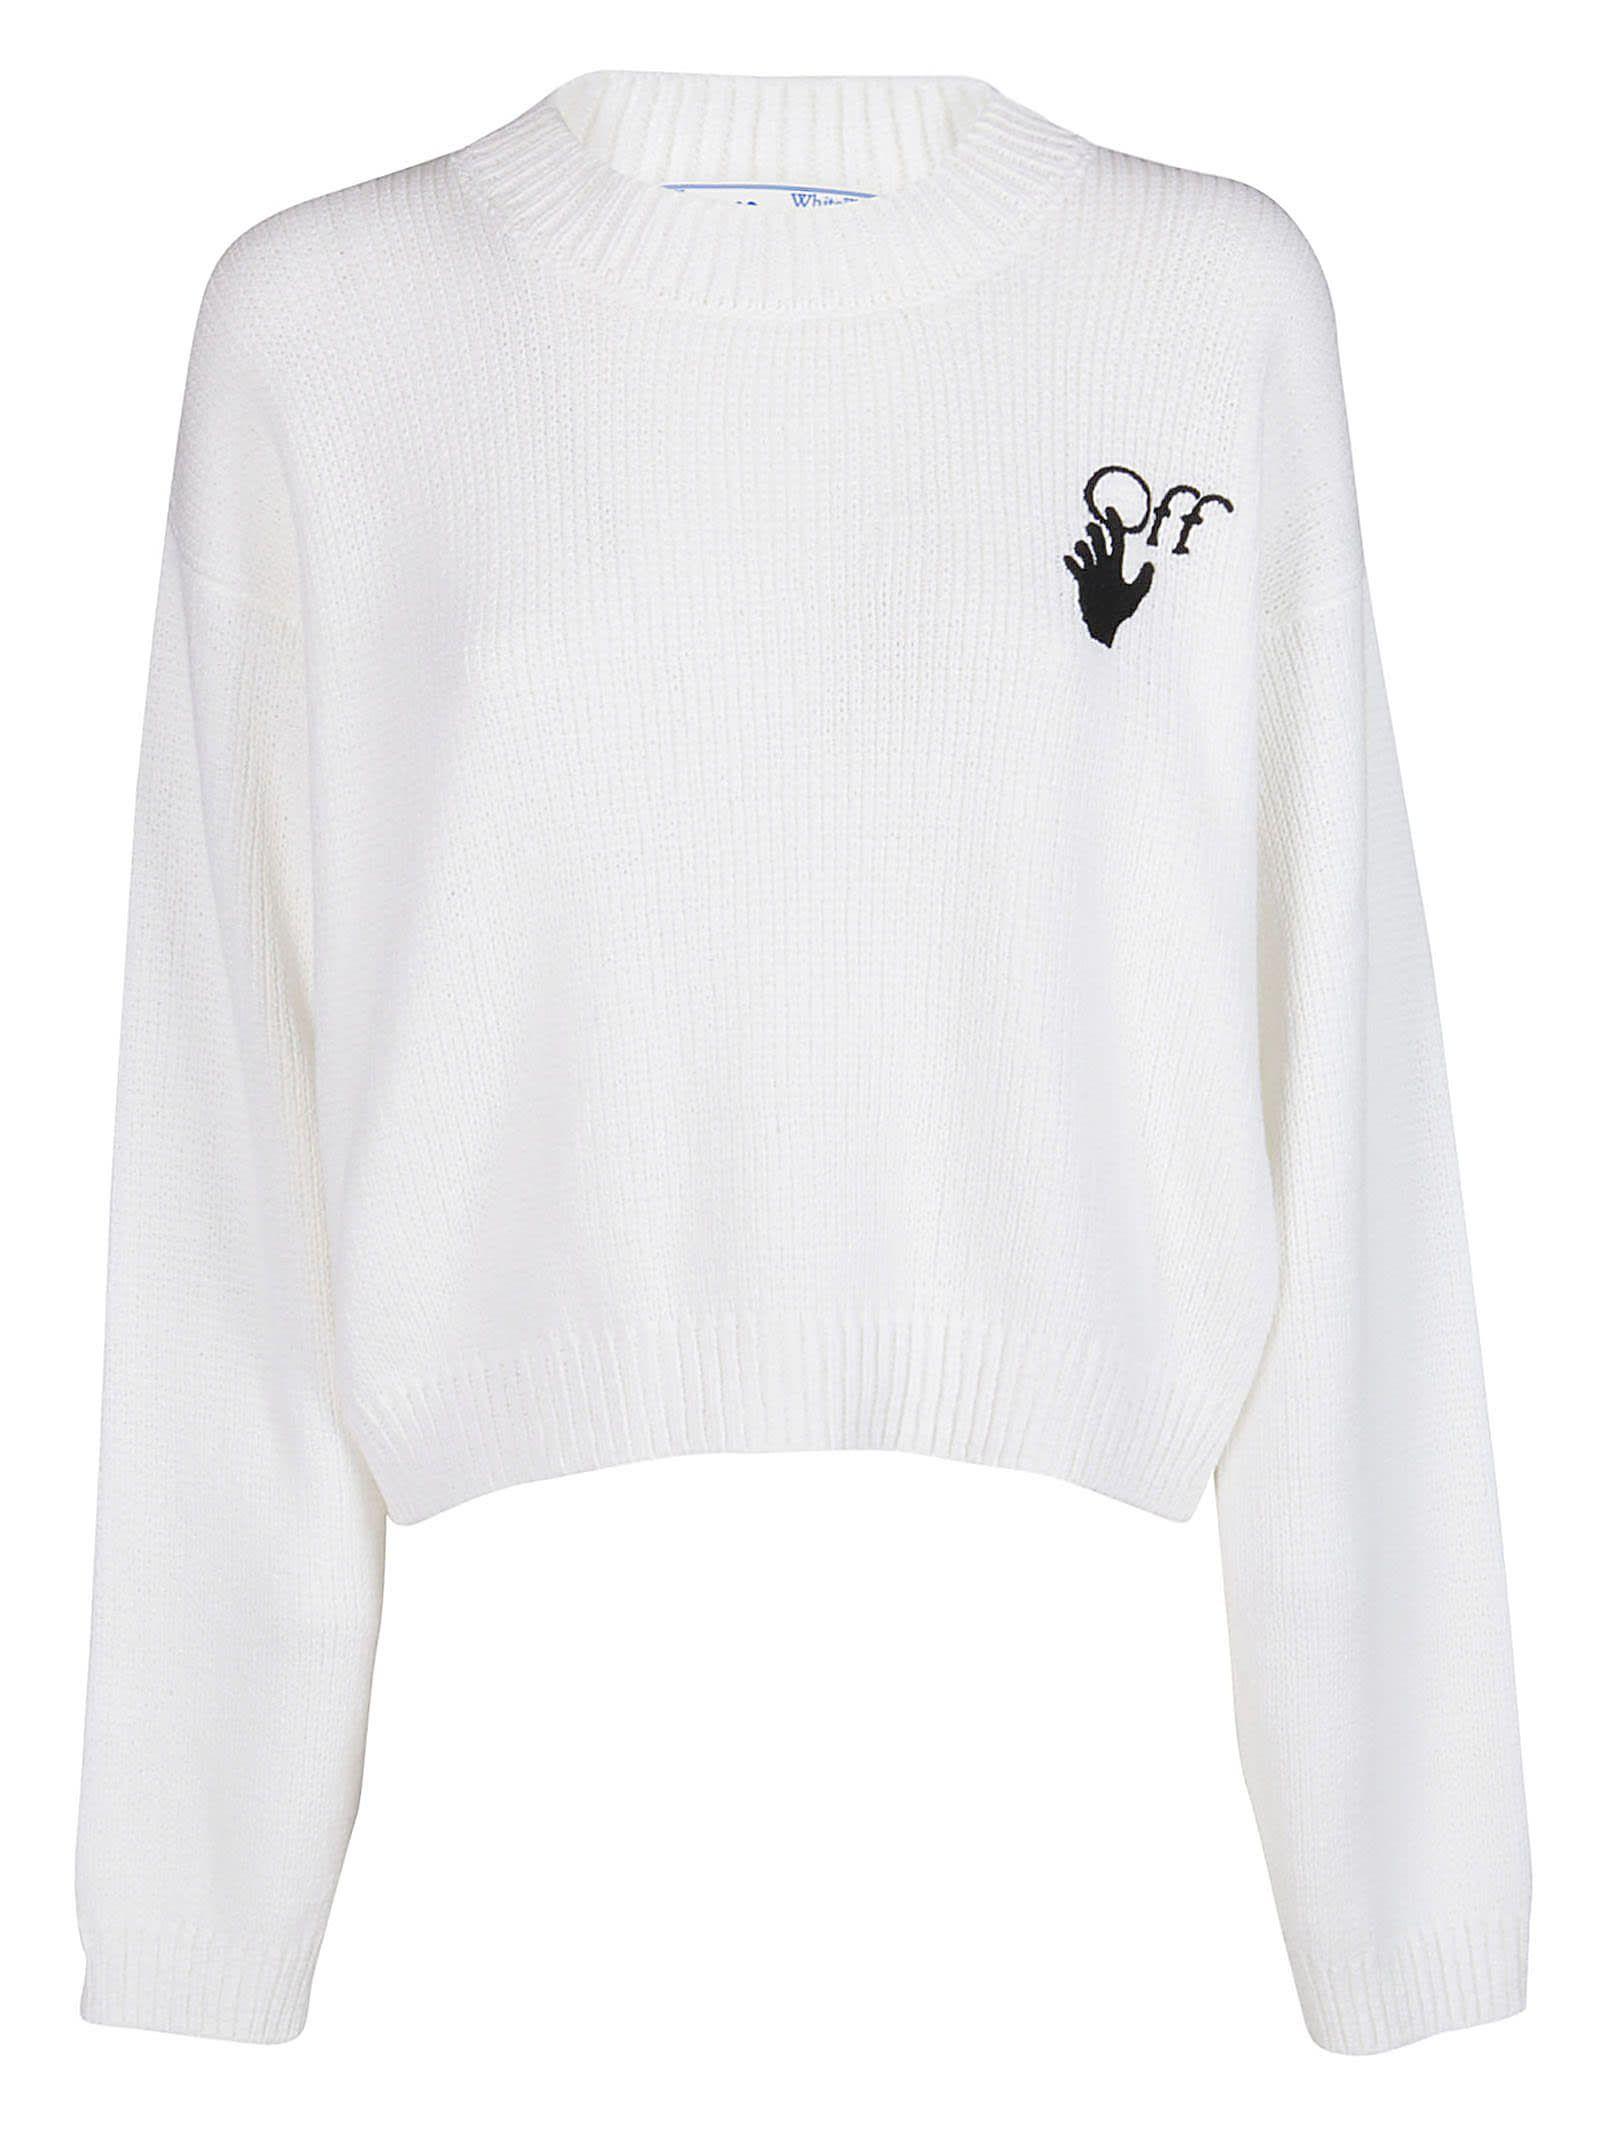 Best Price On The Market At Italist Off White Off White White Cotton Sweatshirt